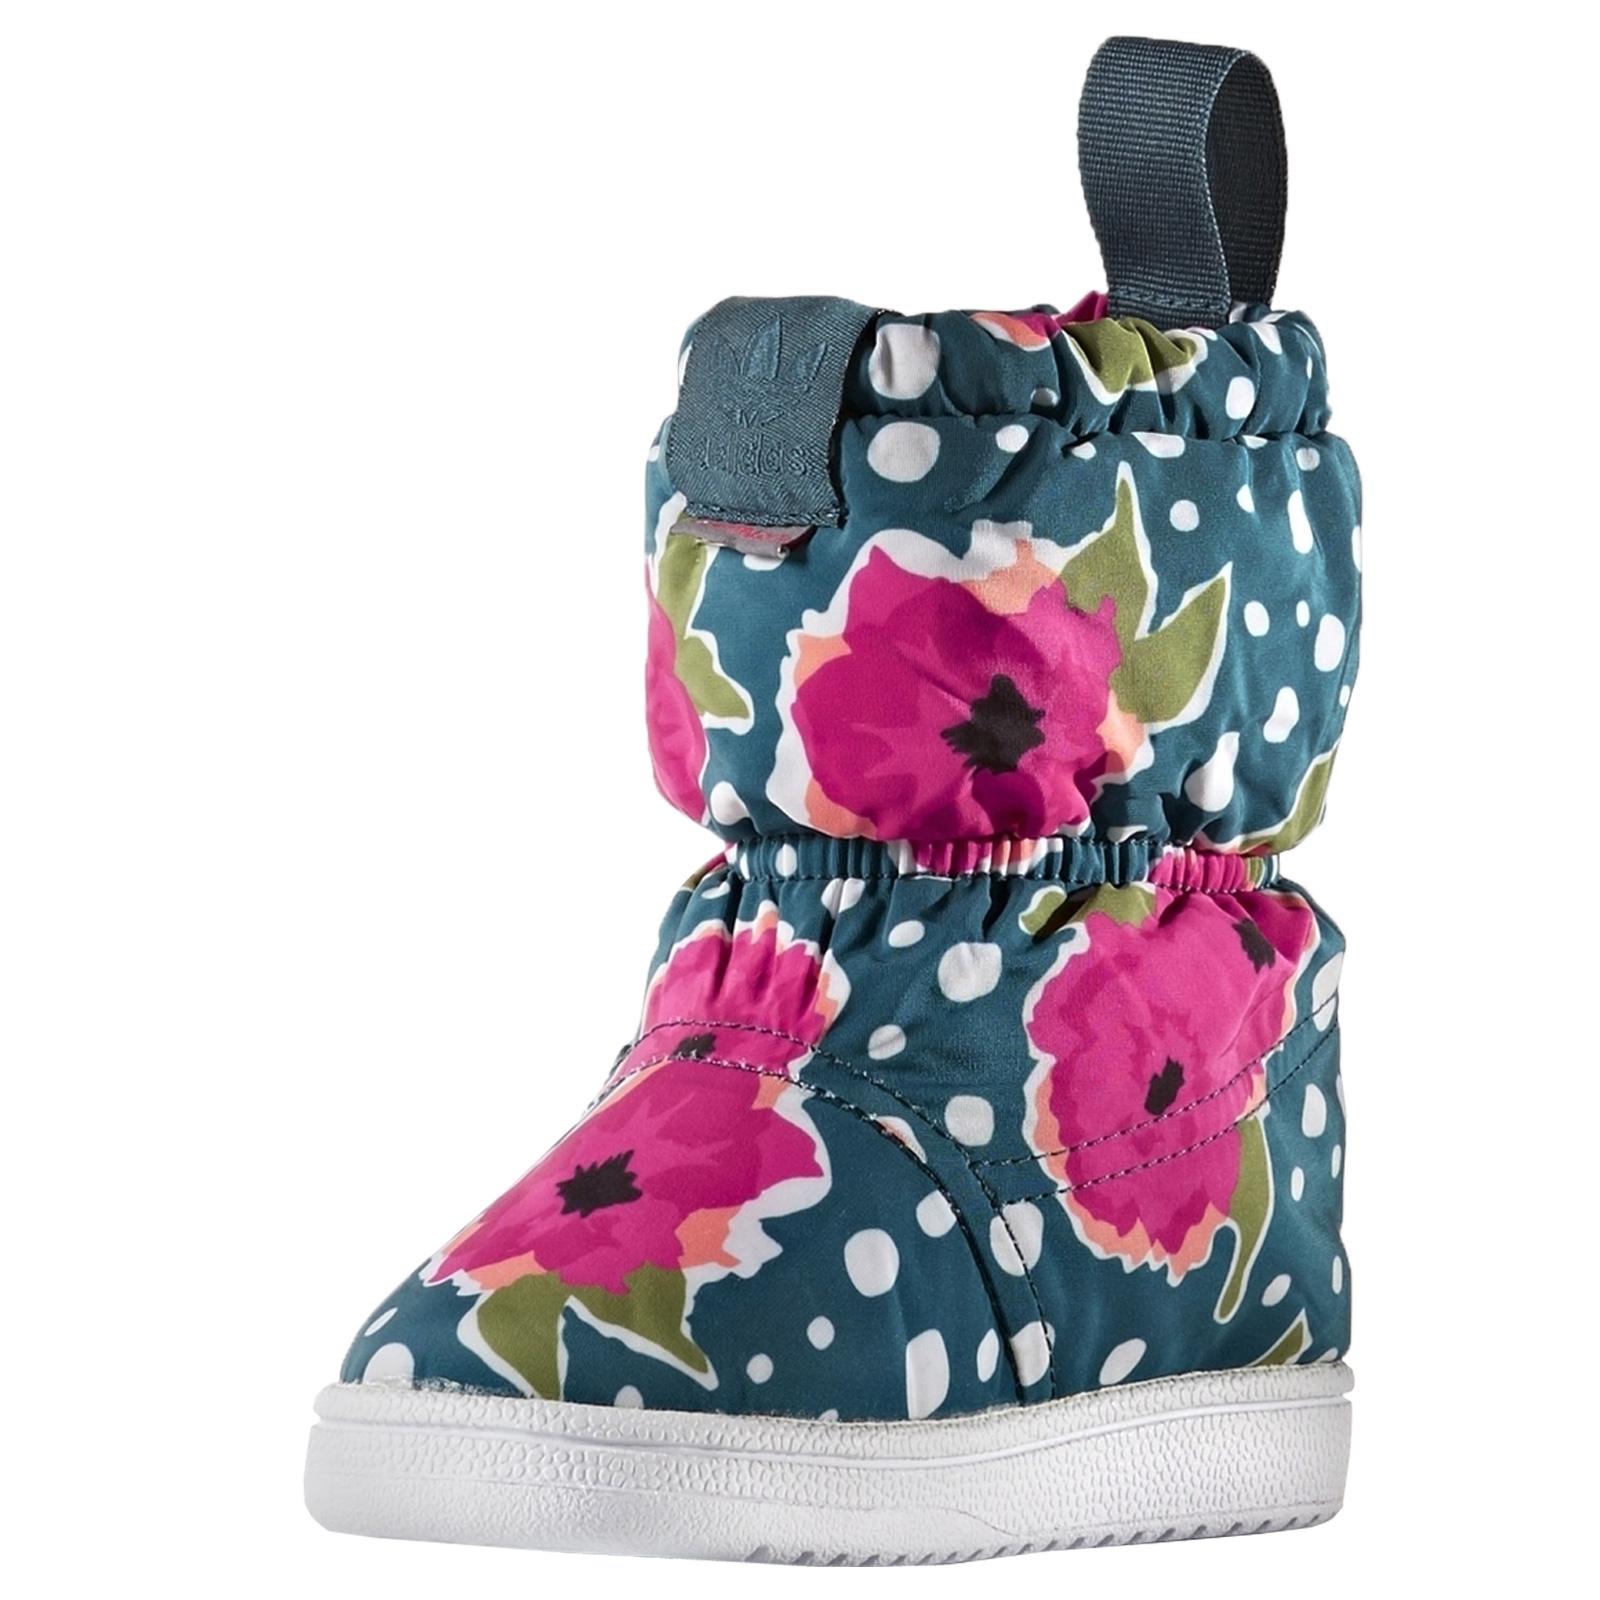 buy online 37f6d eb89e adidas Baby Winter Boot Kinder Schnee Stiefel Winterschuhe dick gefüttert  Blumen